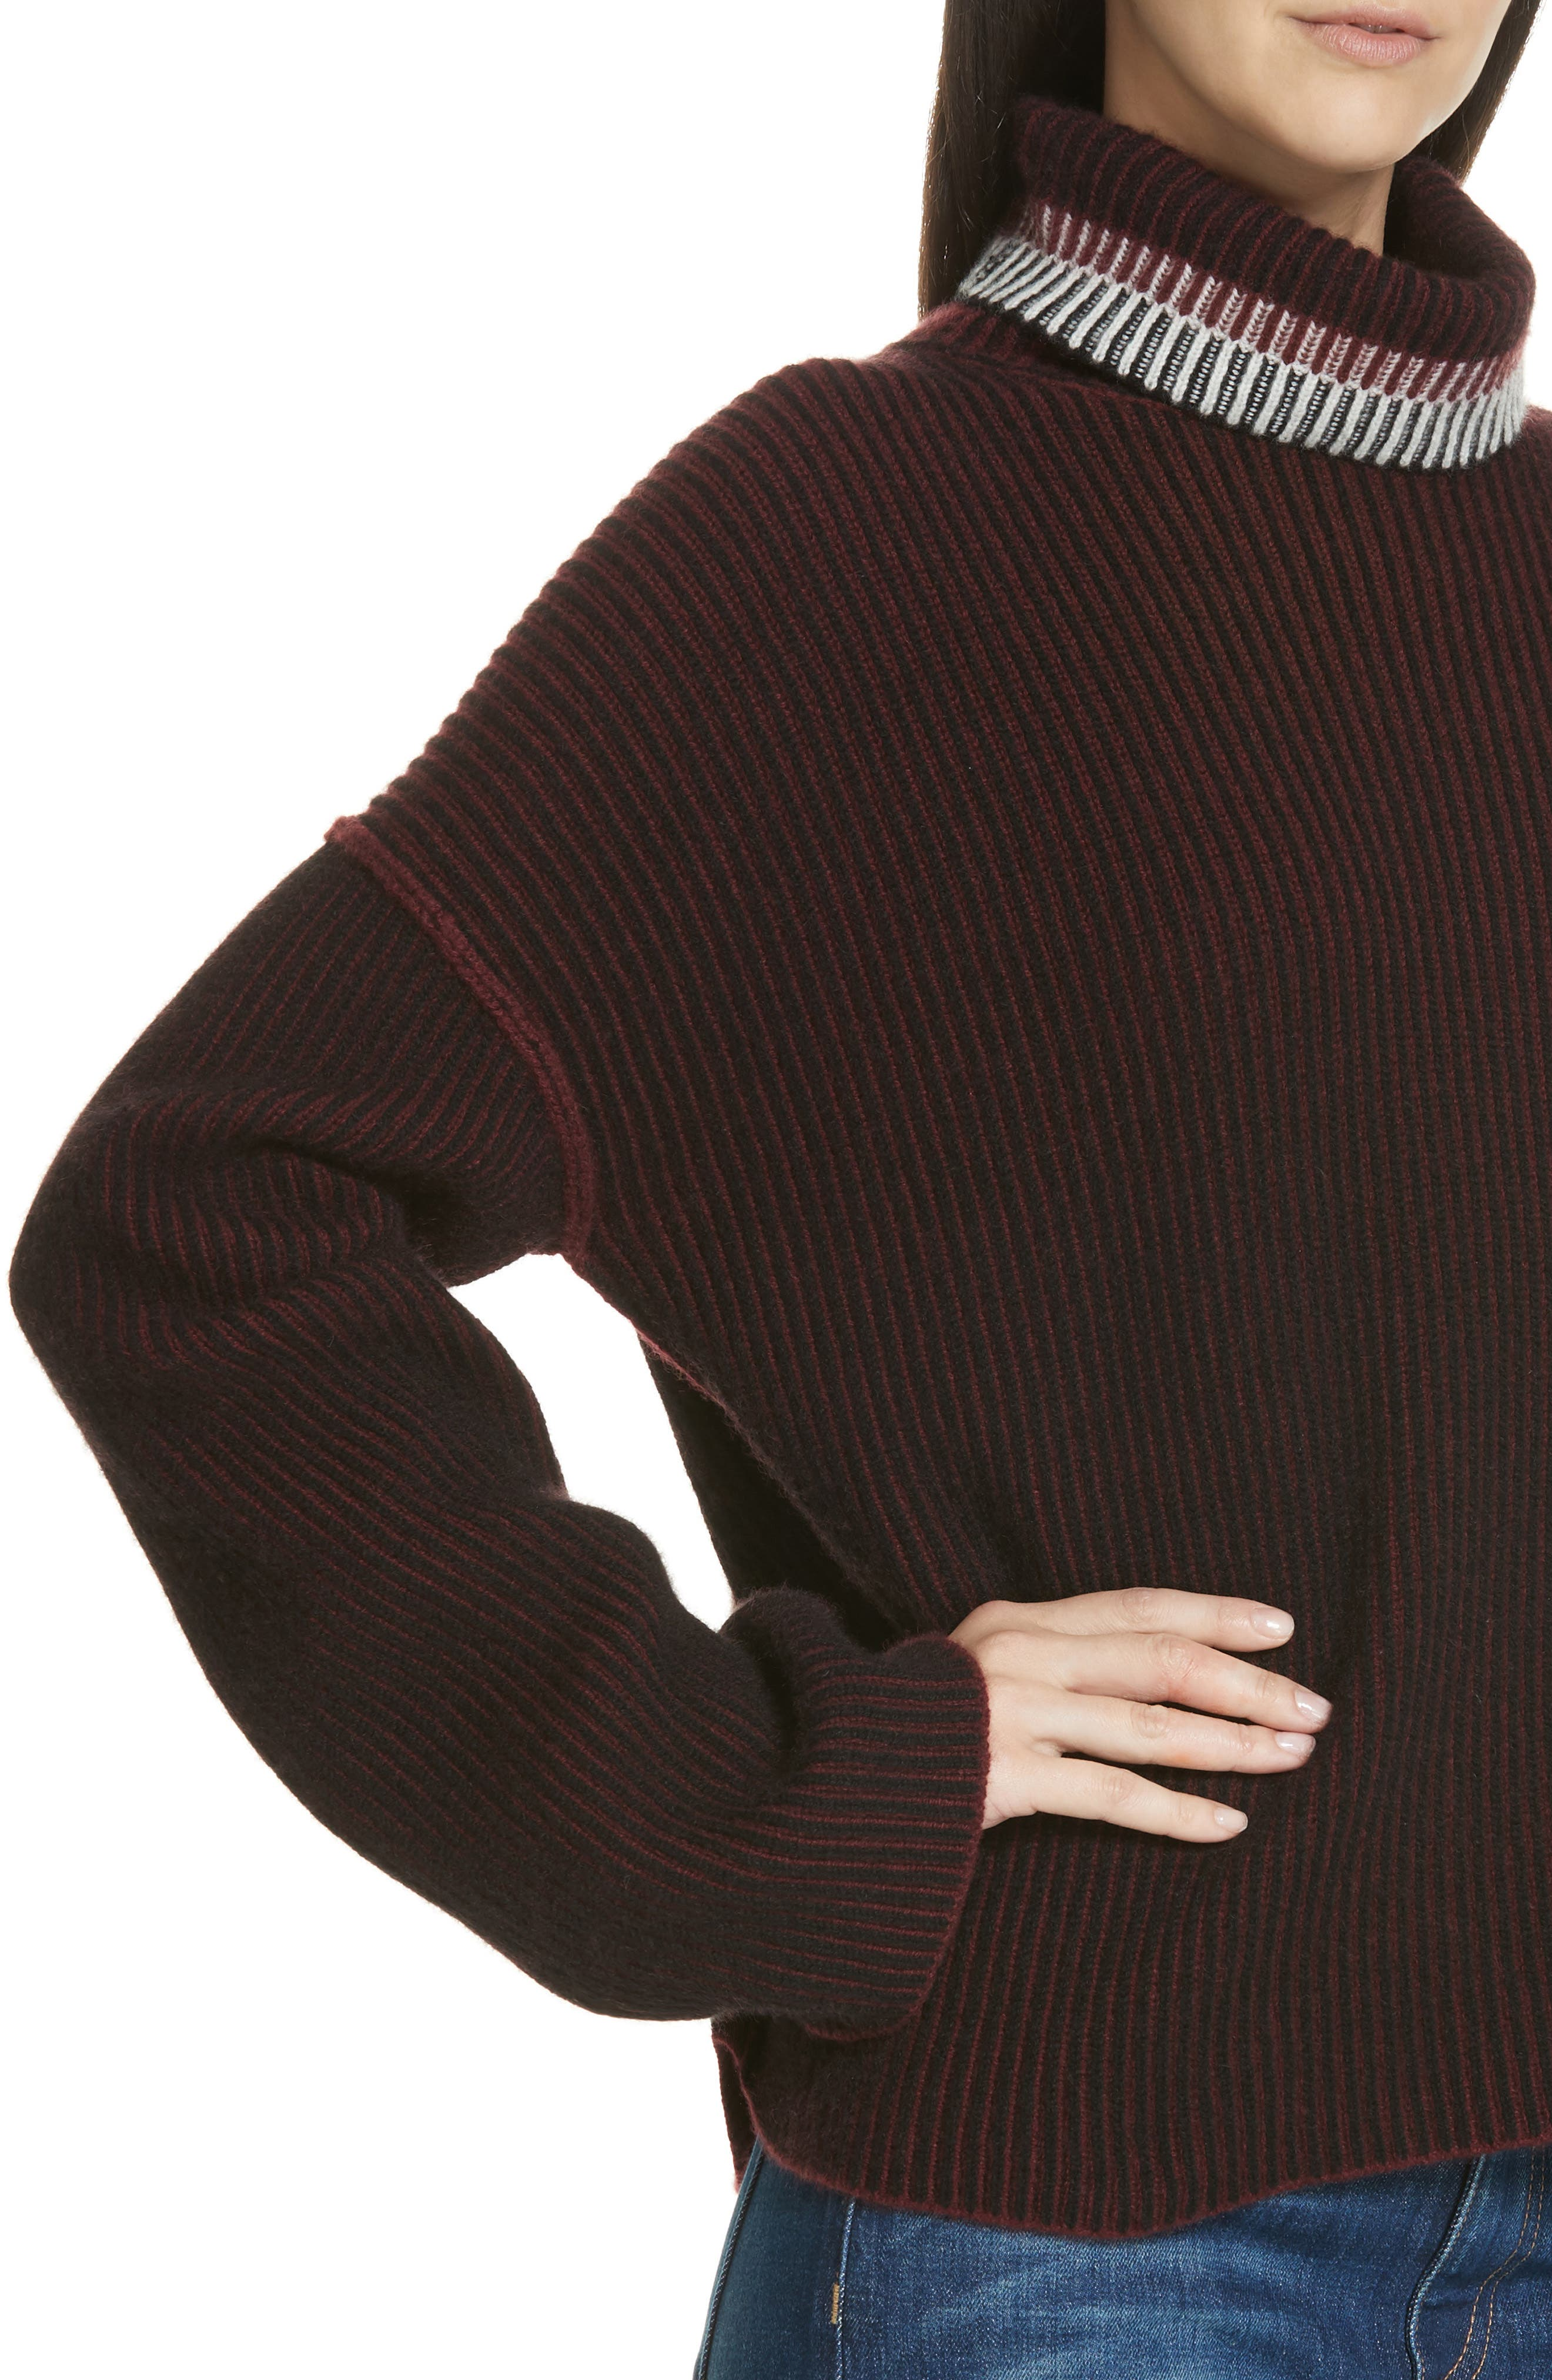 Oversize Cashmere Turtleneck Sweater,                             Alternate thumbnail 4, color,                             DARK CURRANT MIX